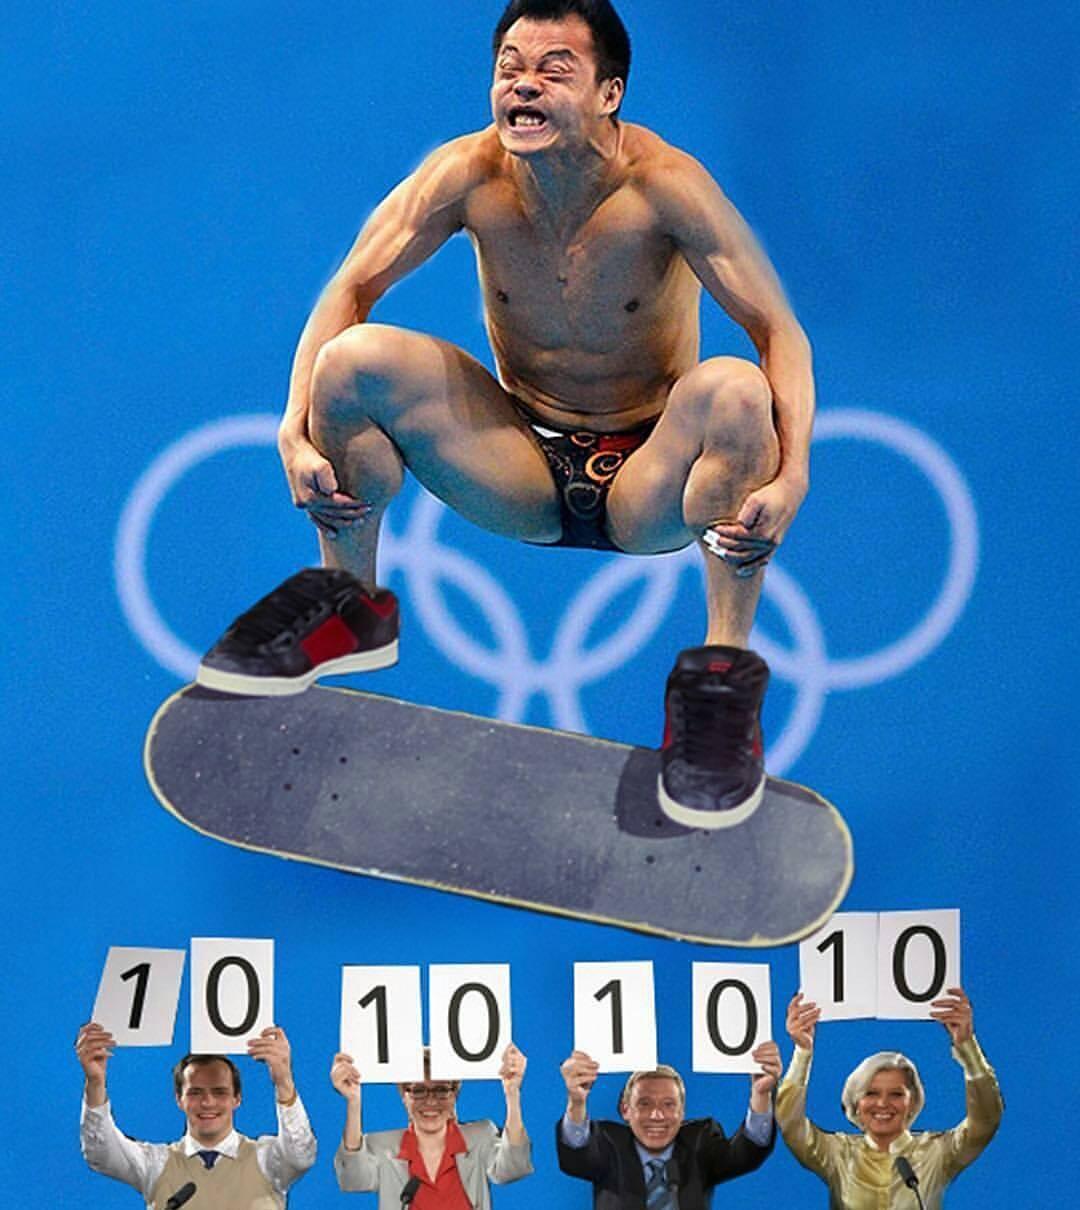 #skateboardingisnotasport #olimpicskaters #olimpicskateboarding  #fuckolimpics